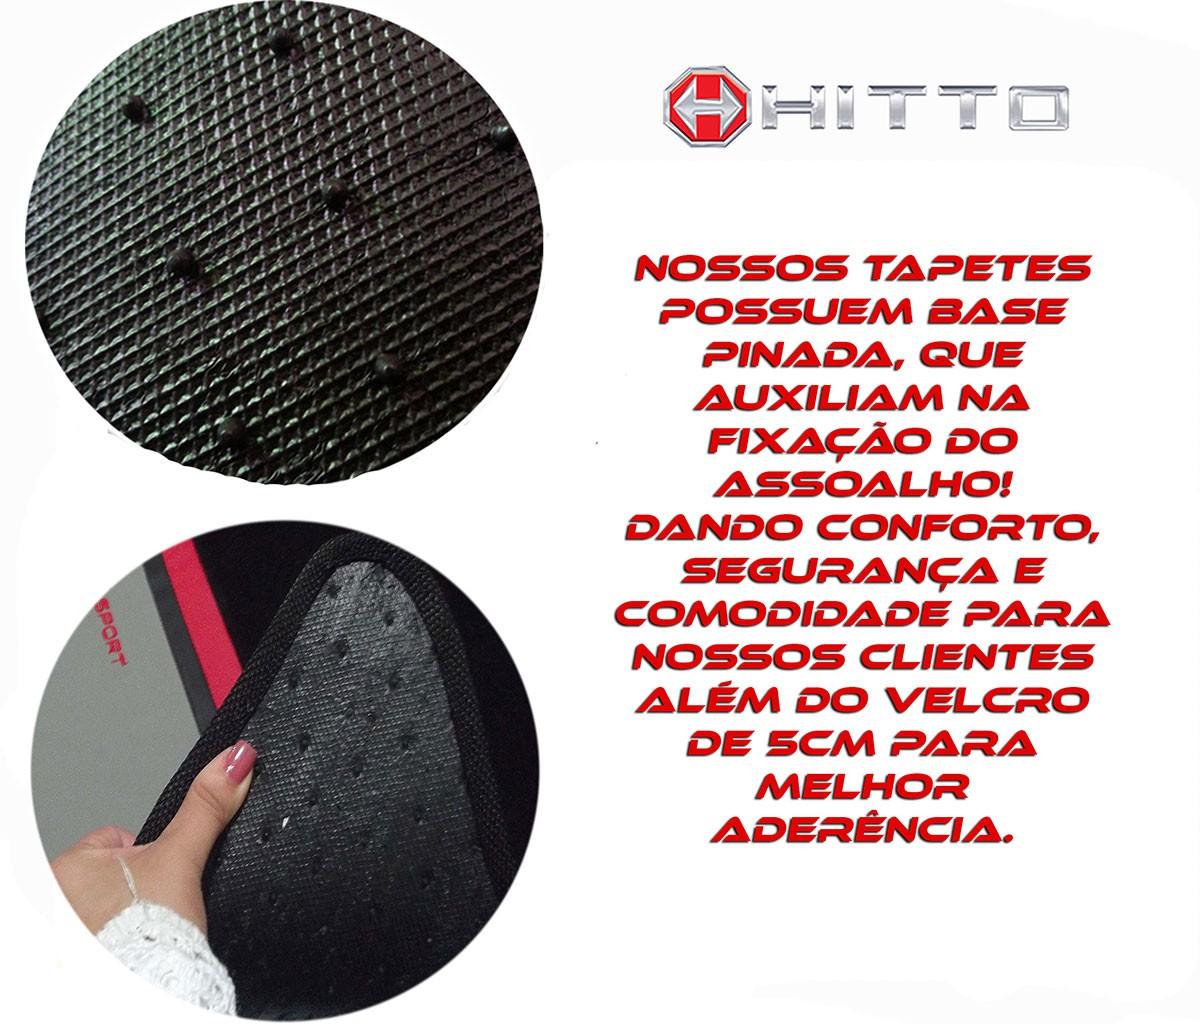 Tapete Audi Q3 Carpete Luxo Base Borracha Pinada Hitto